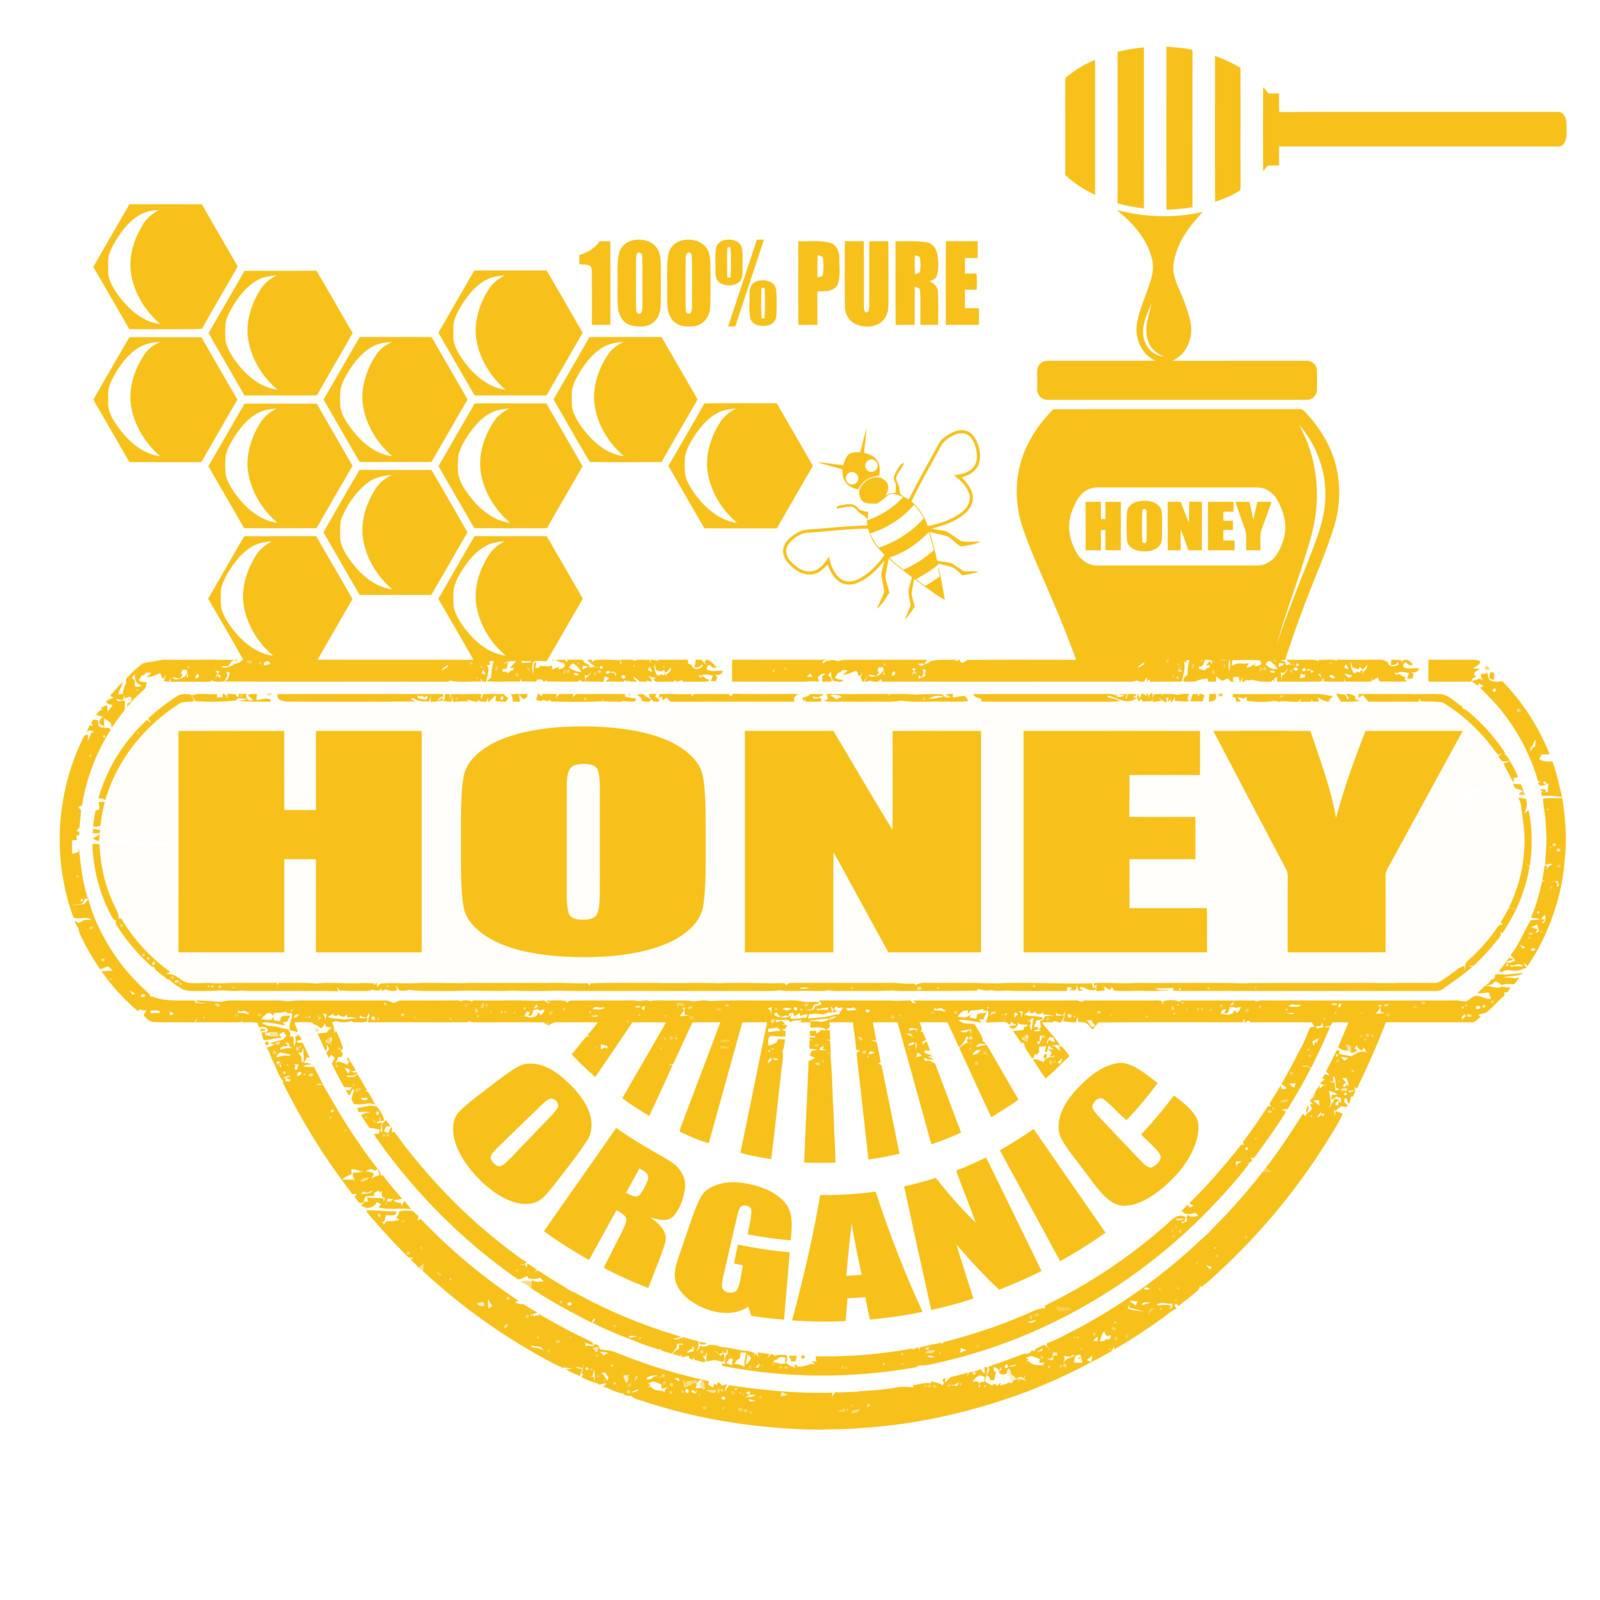 Honey grunge rubber stamp on white background, vector illustration